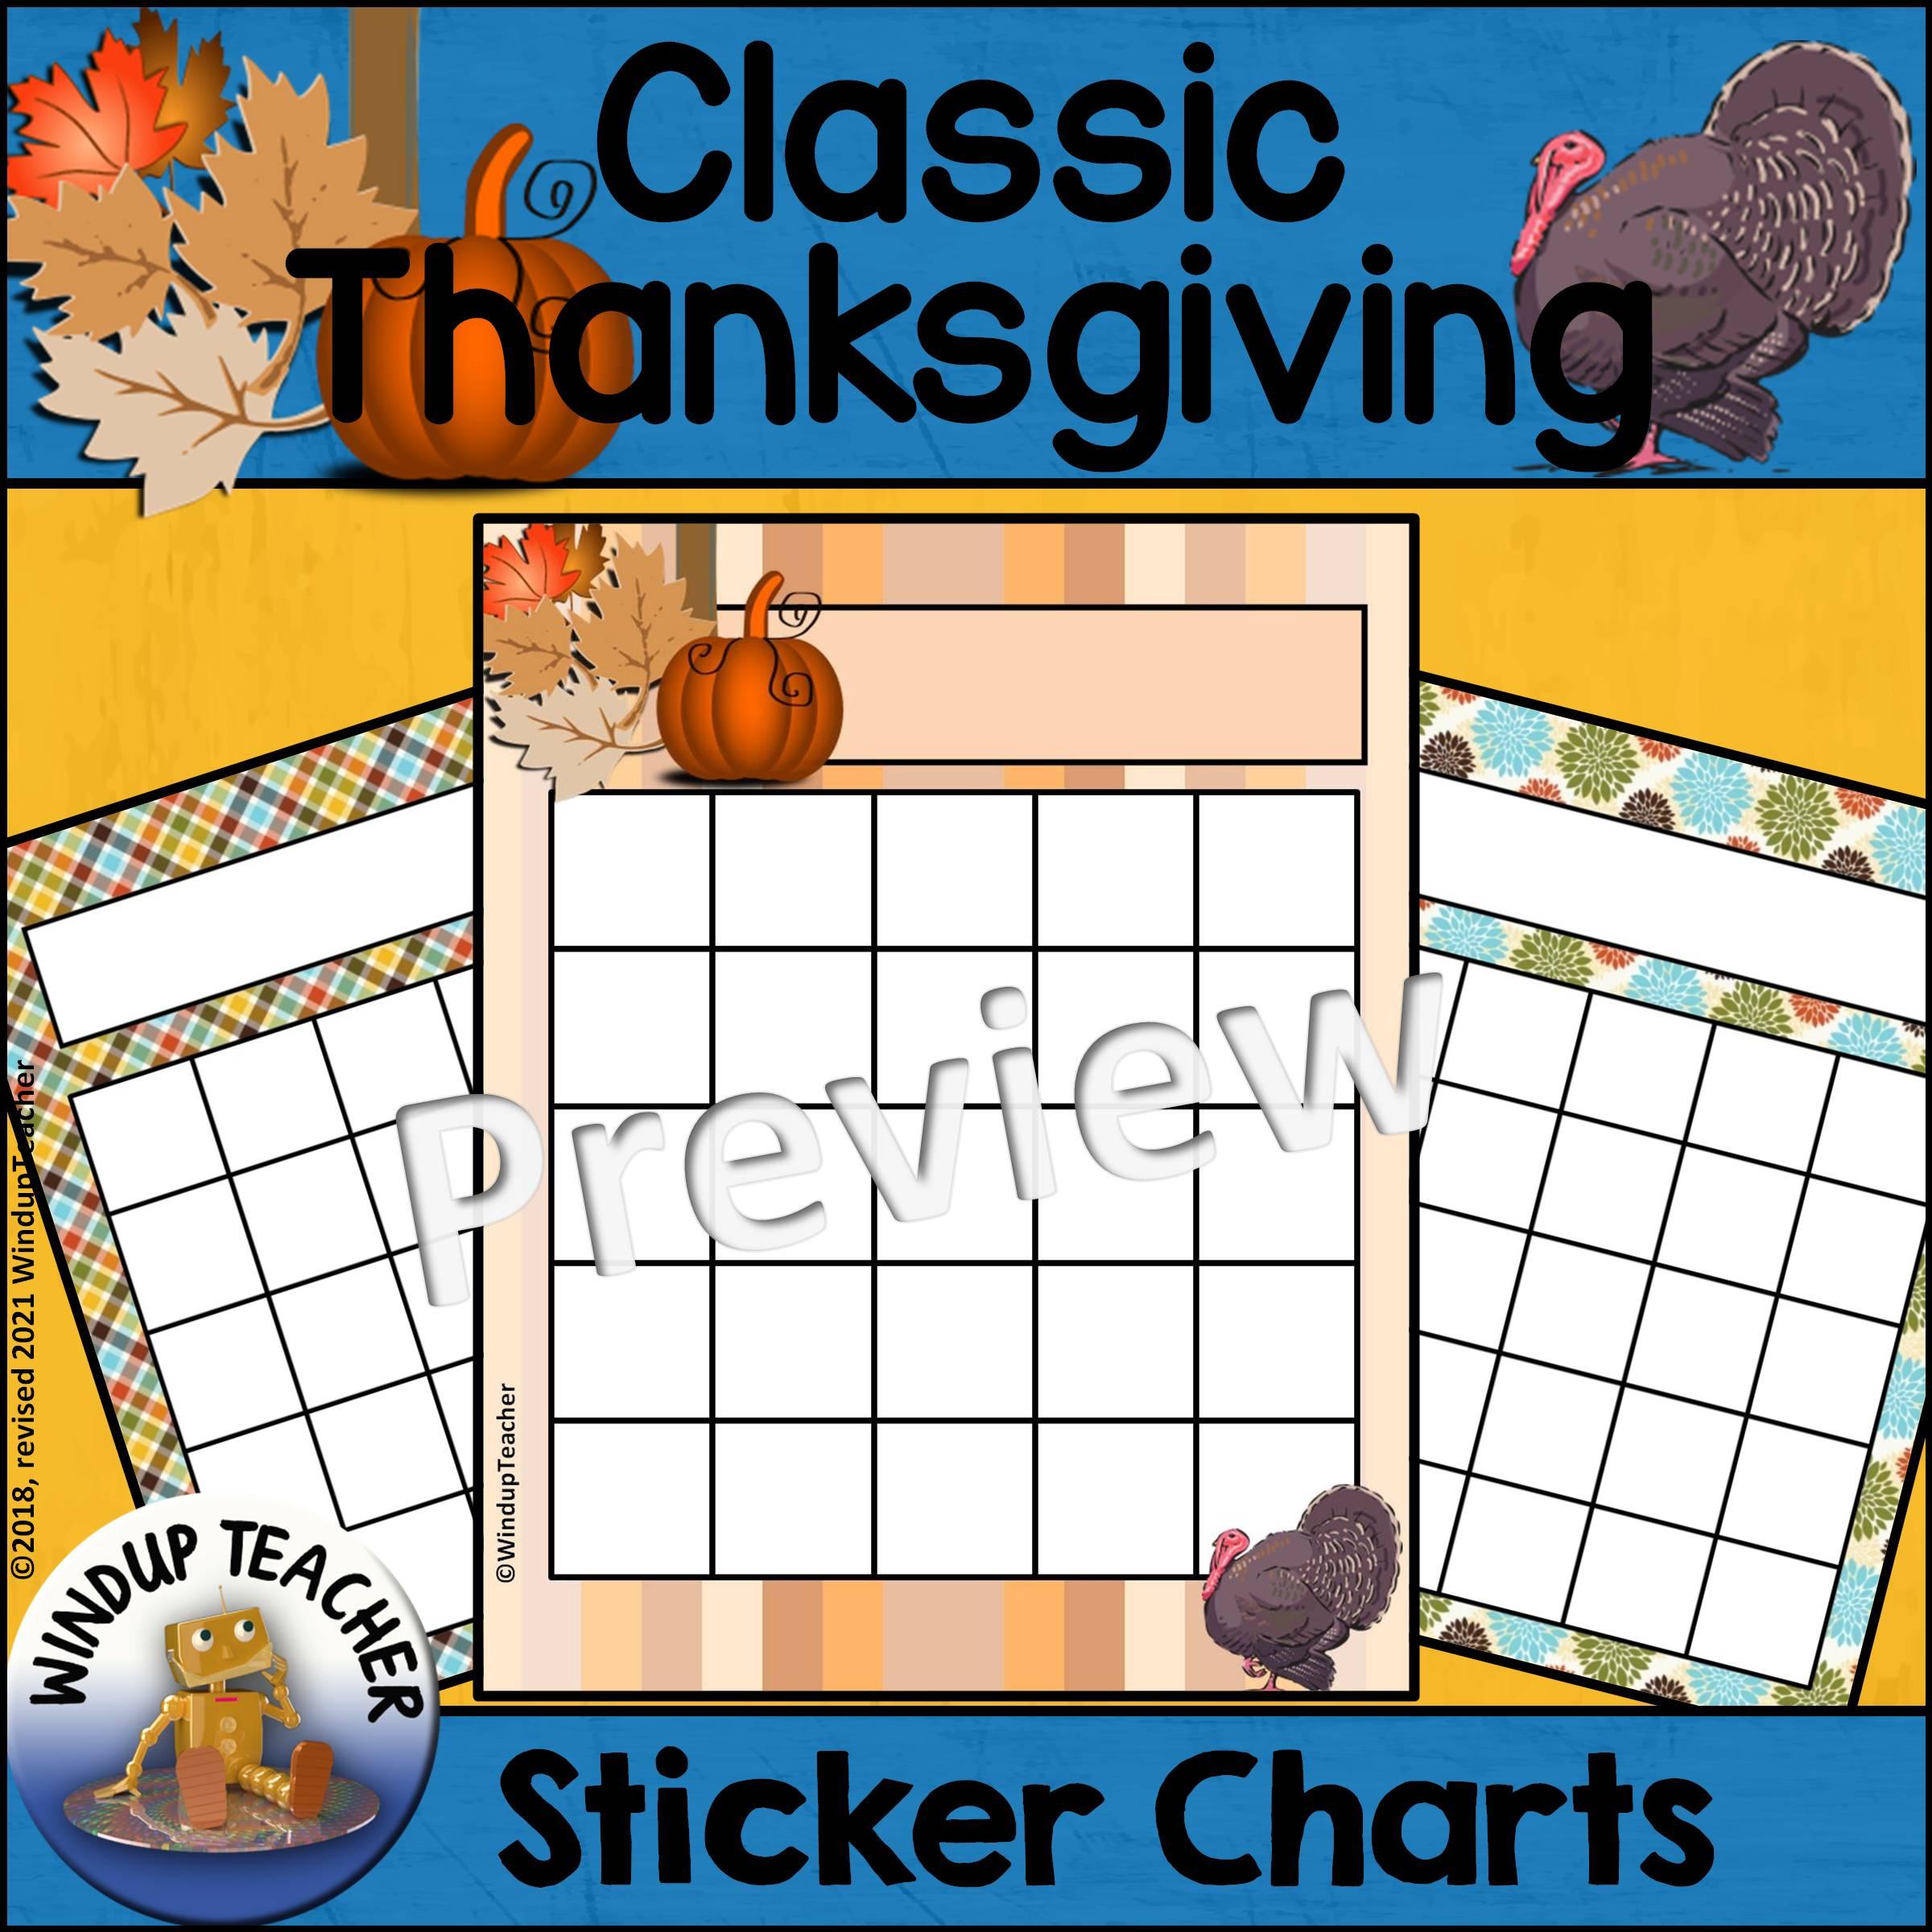 Classic Thanksgiving Sticker Charts